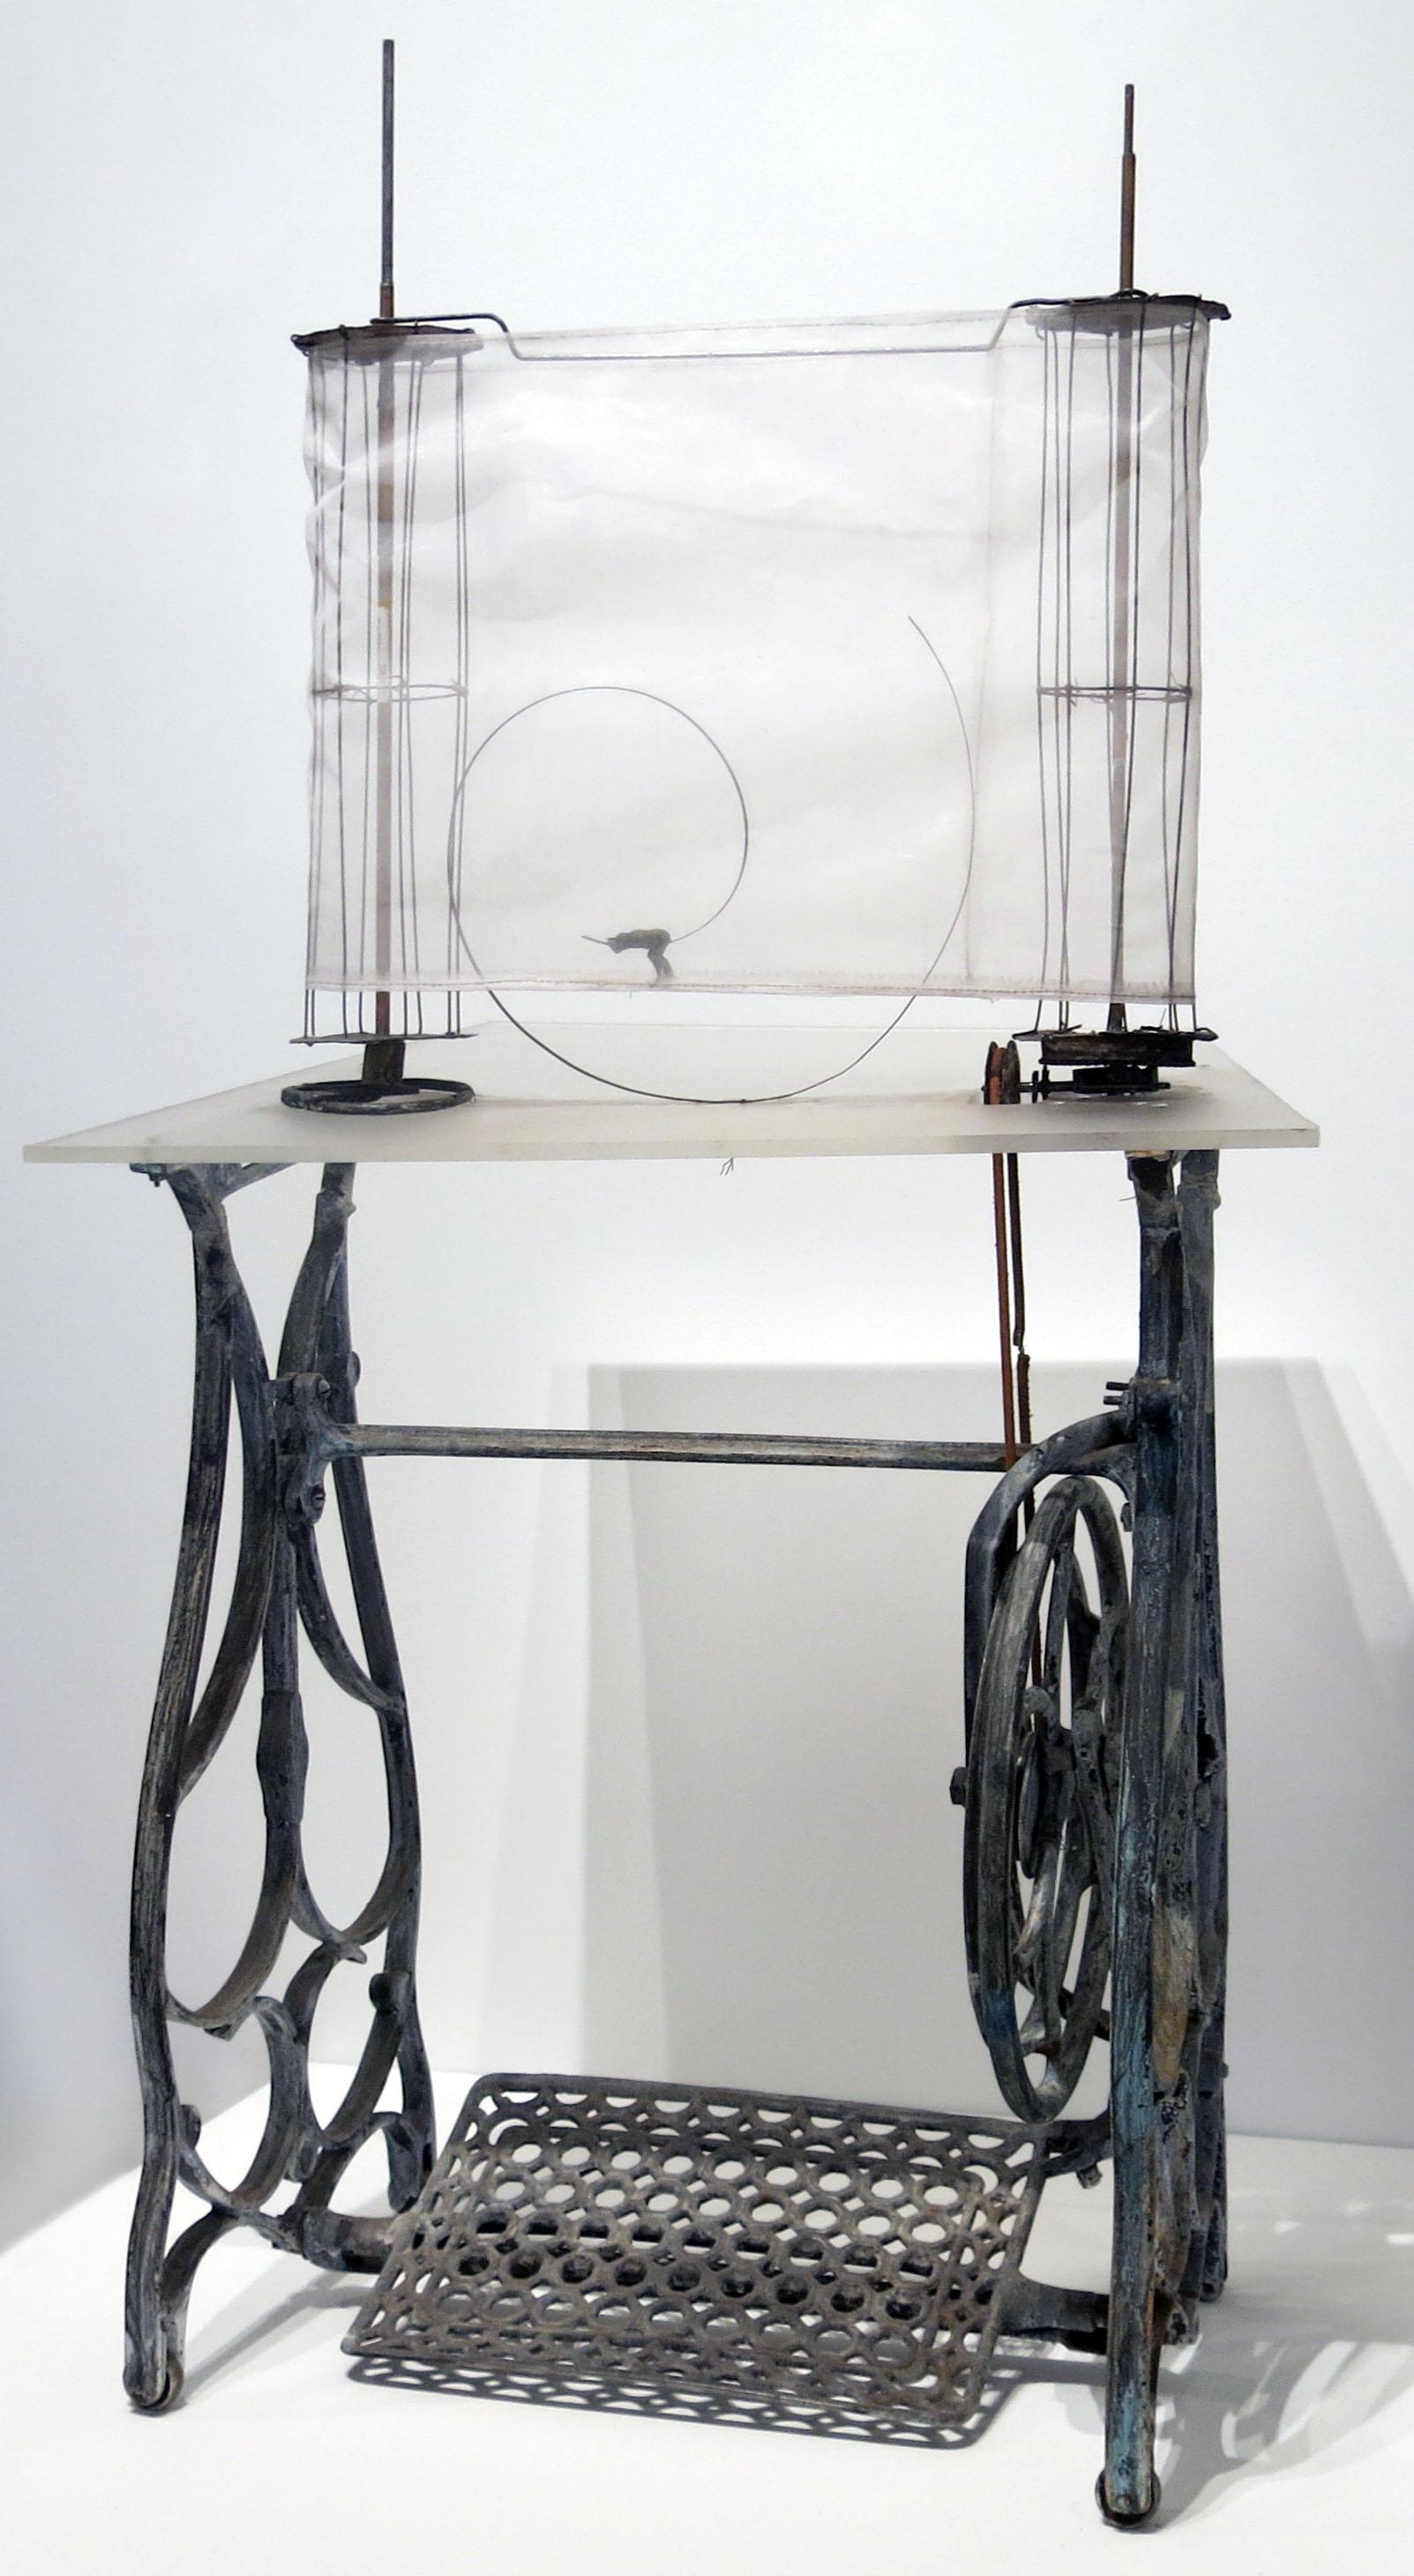 June Leaf, Figure Running on the Seam , 2014, Cast iron, tin, plexiglas, mesh, acrylic, leather, 50h x 26w x 20.25d in.